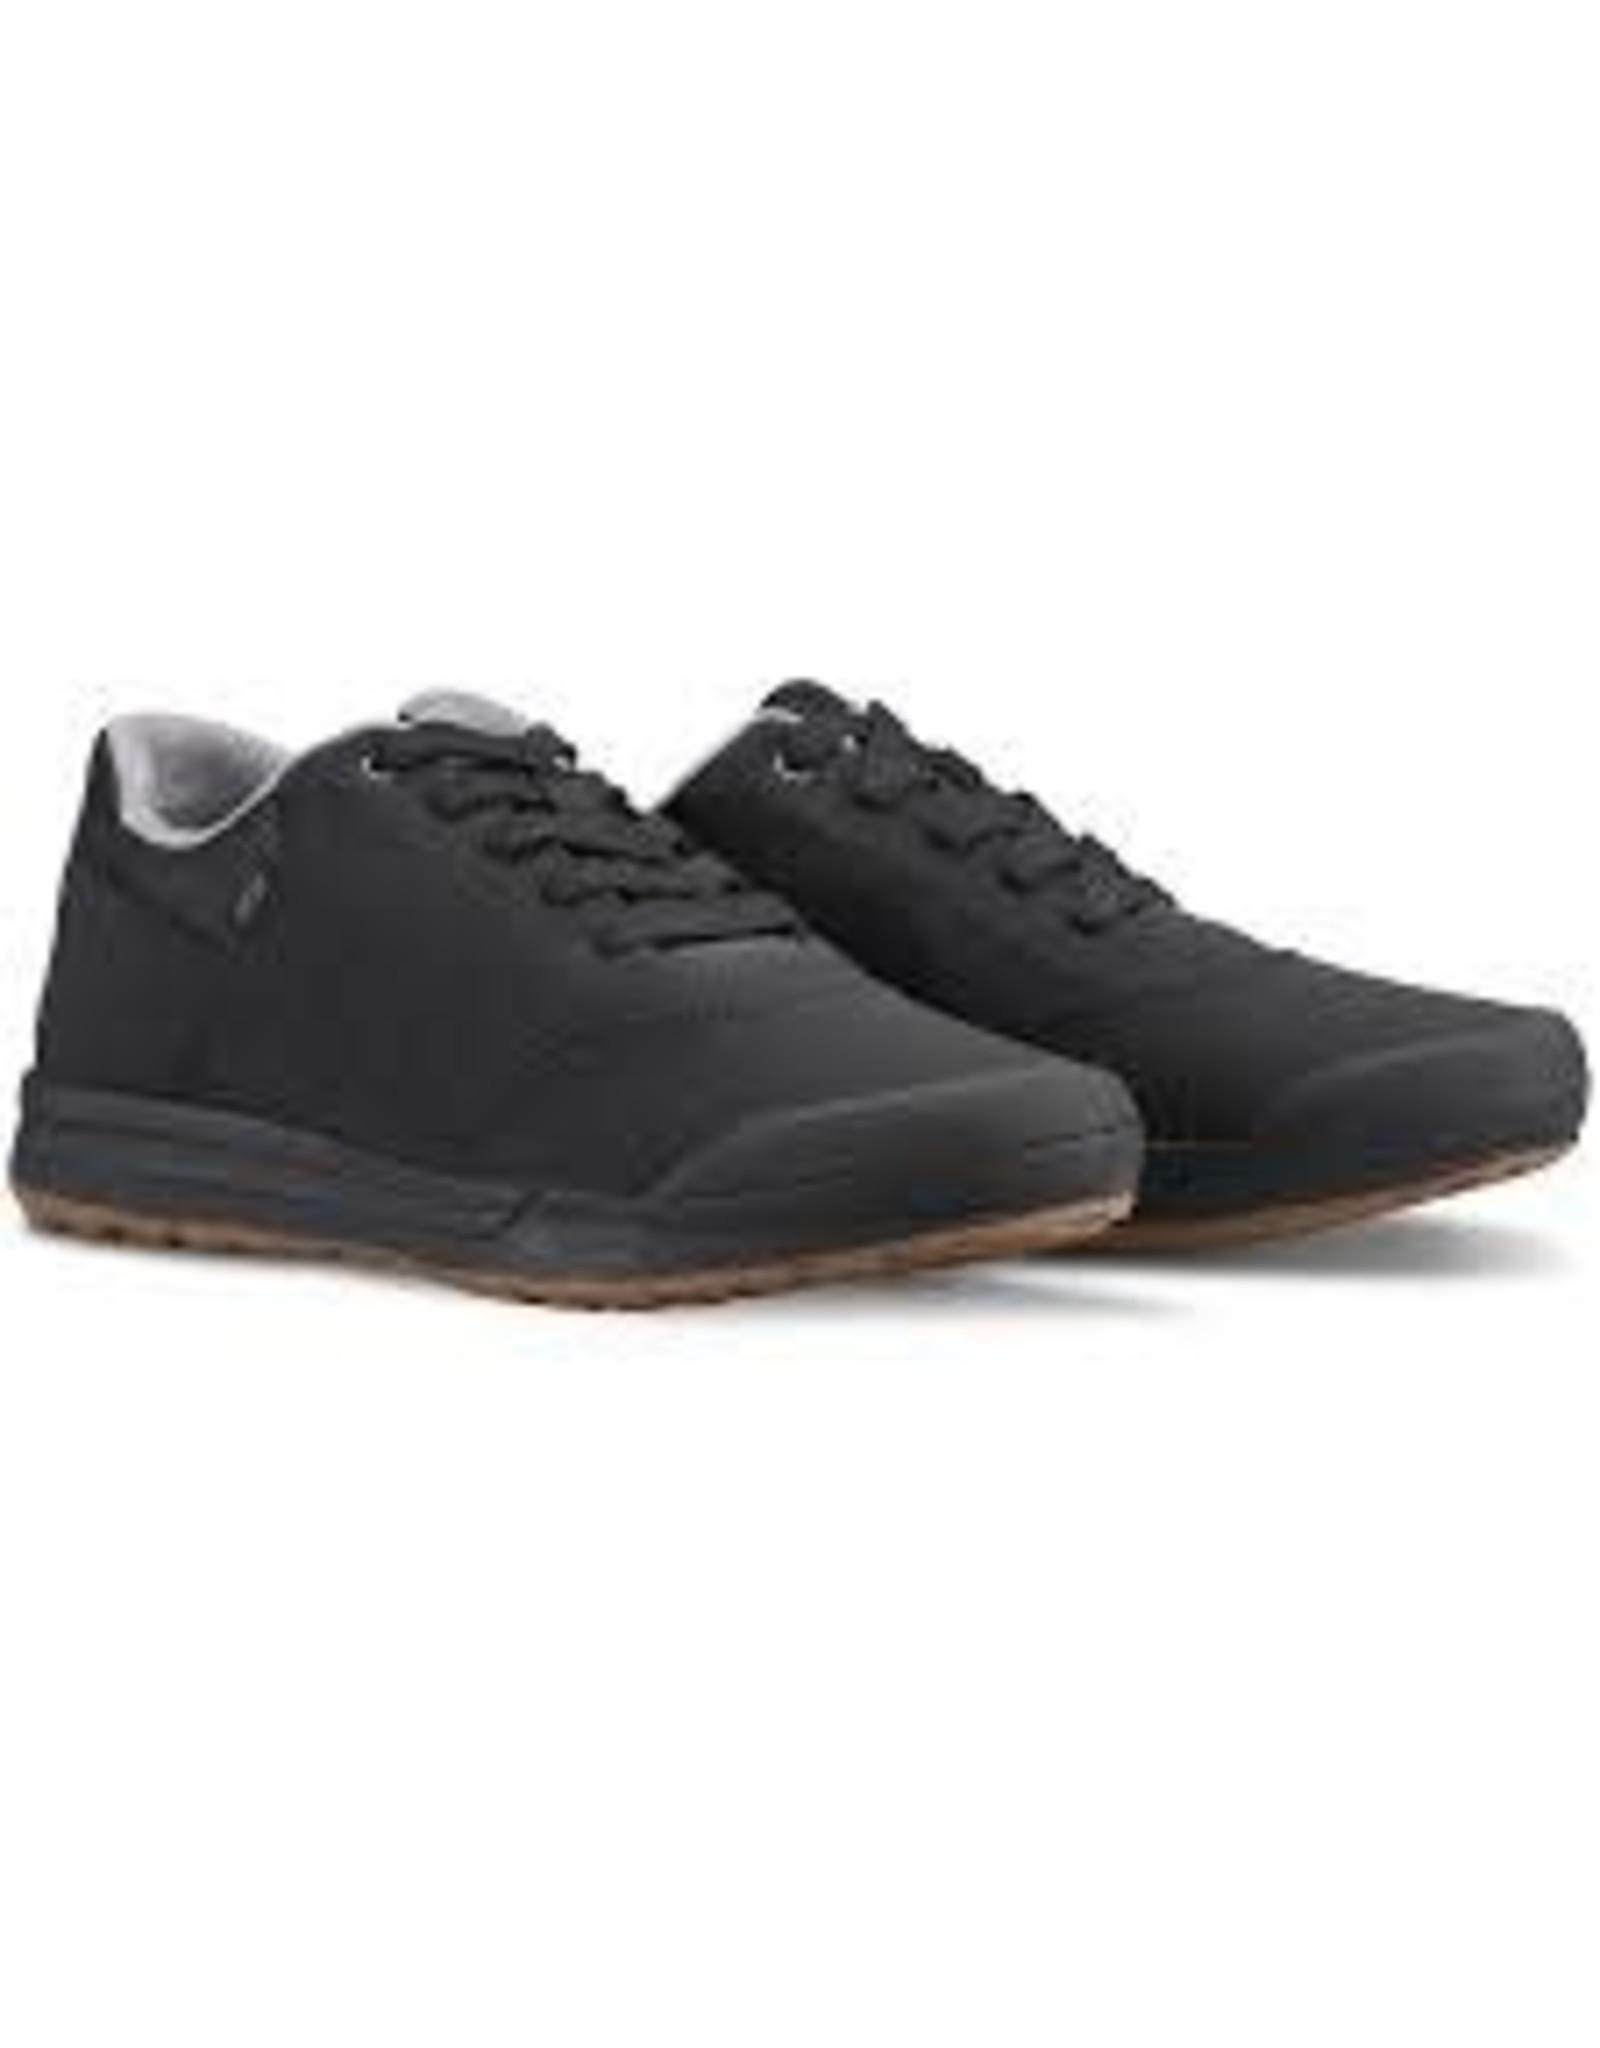 Specialized Shoe Spec 2FO Roost SPD 45.5 Black/Gum